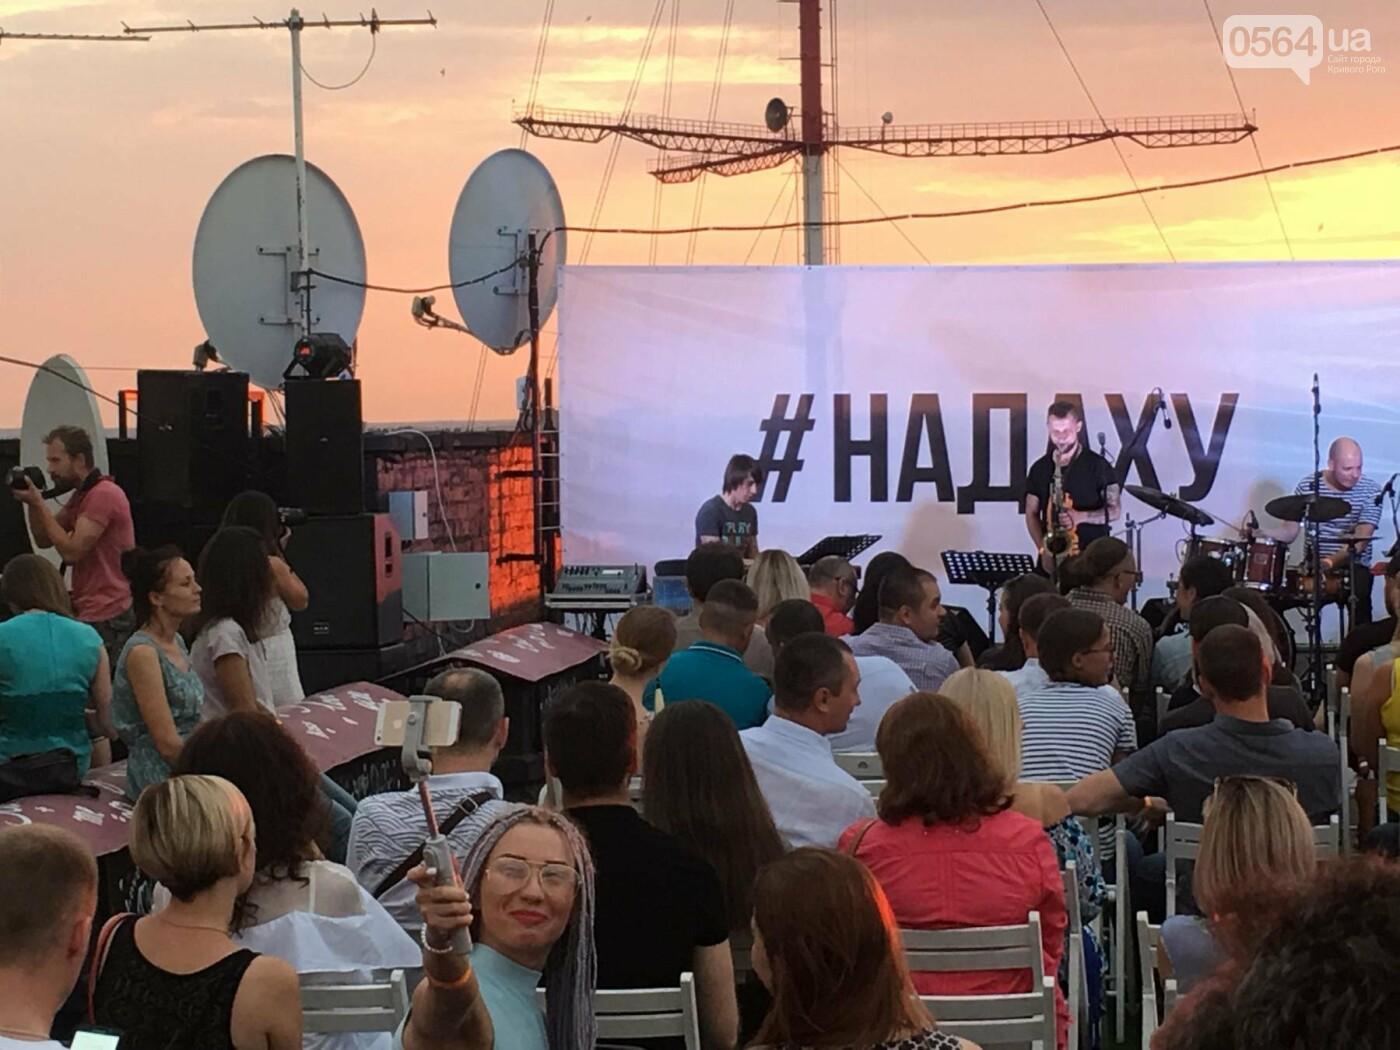 Сотни криворожан встречали закат на крыше отеля под мелодии джаза, - ФОТО, ВИДЕО, фото-18